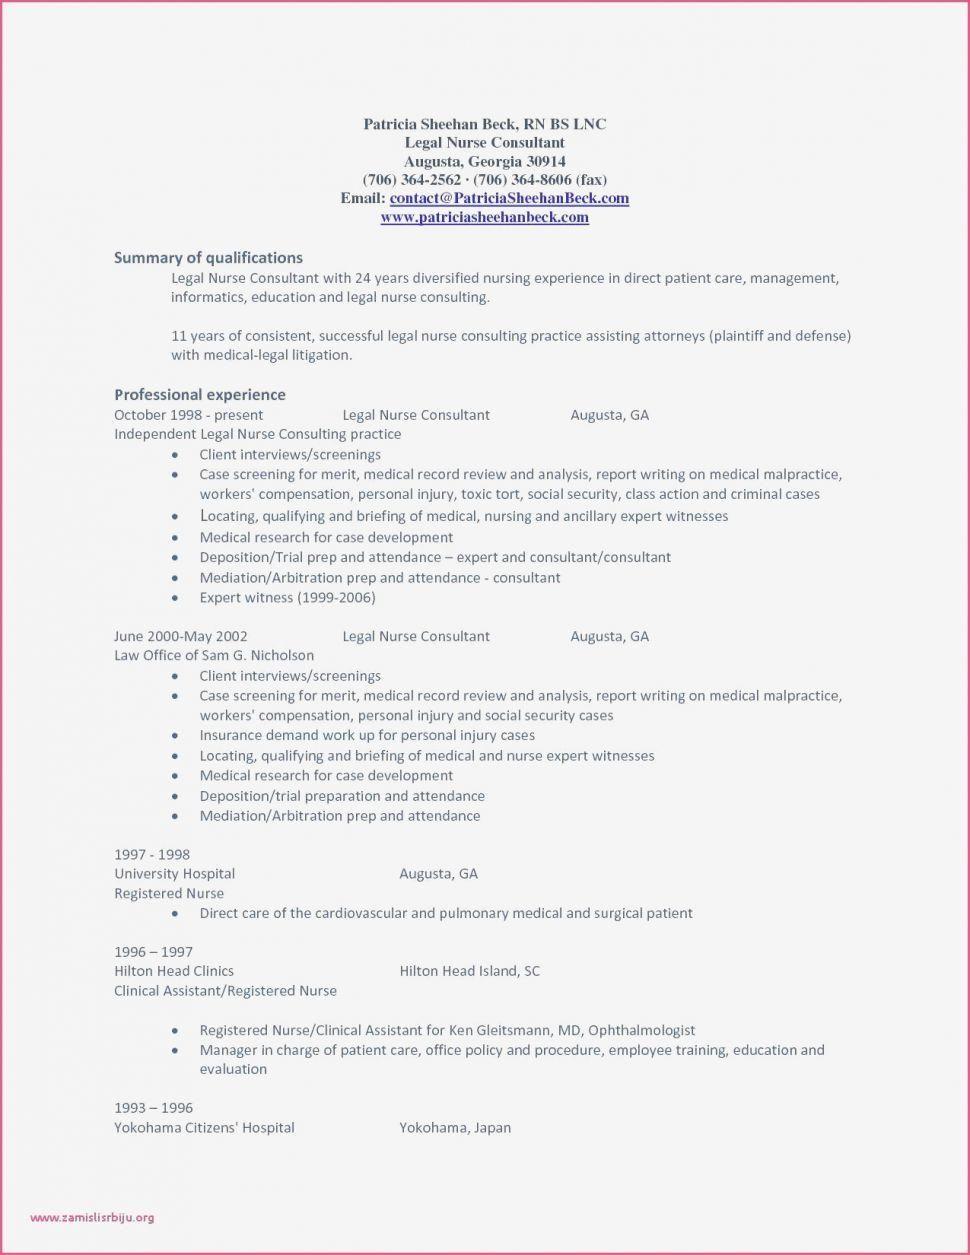 32 New Registered Nurse Resume Objectives in 2020 Legal